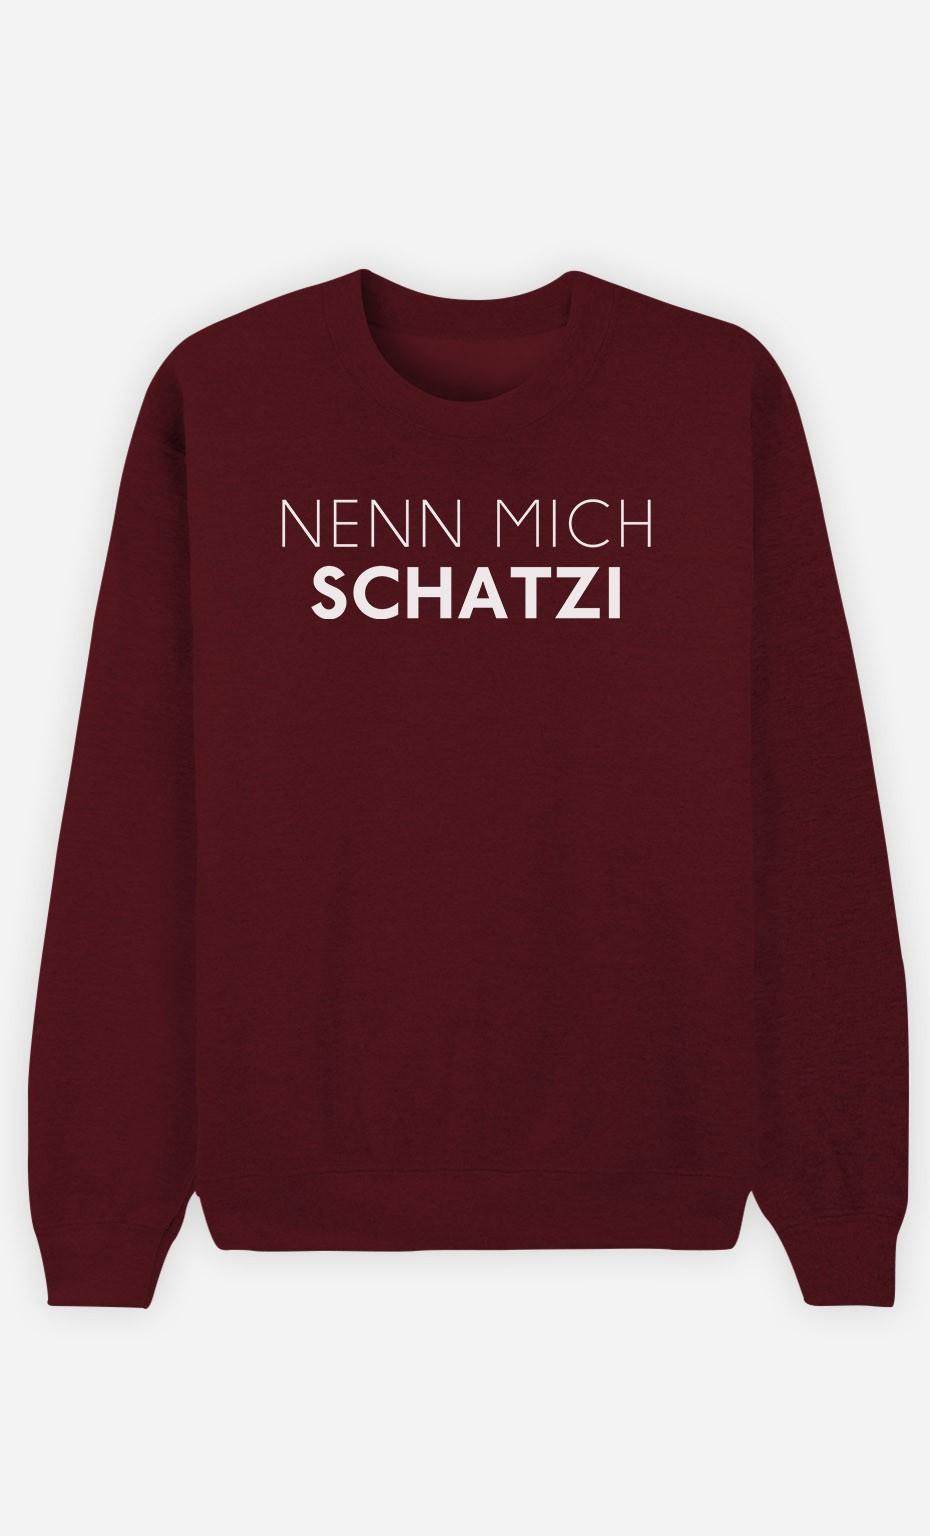 Burgunderrot Sweatshirt Nenn mich Schatzi